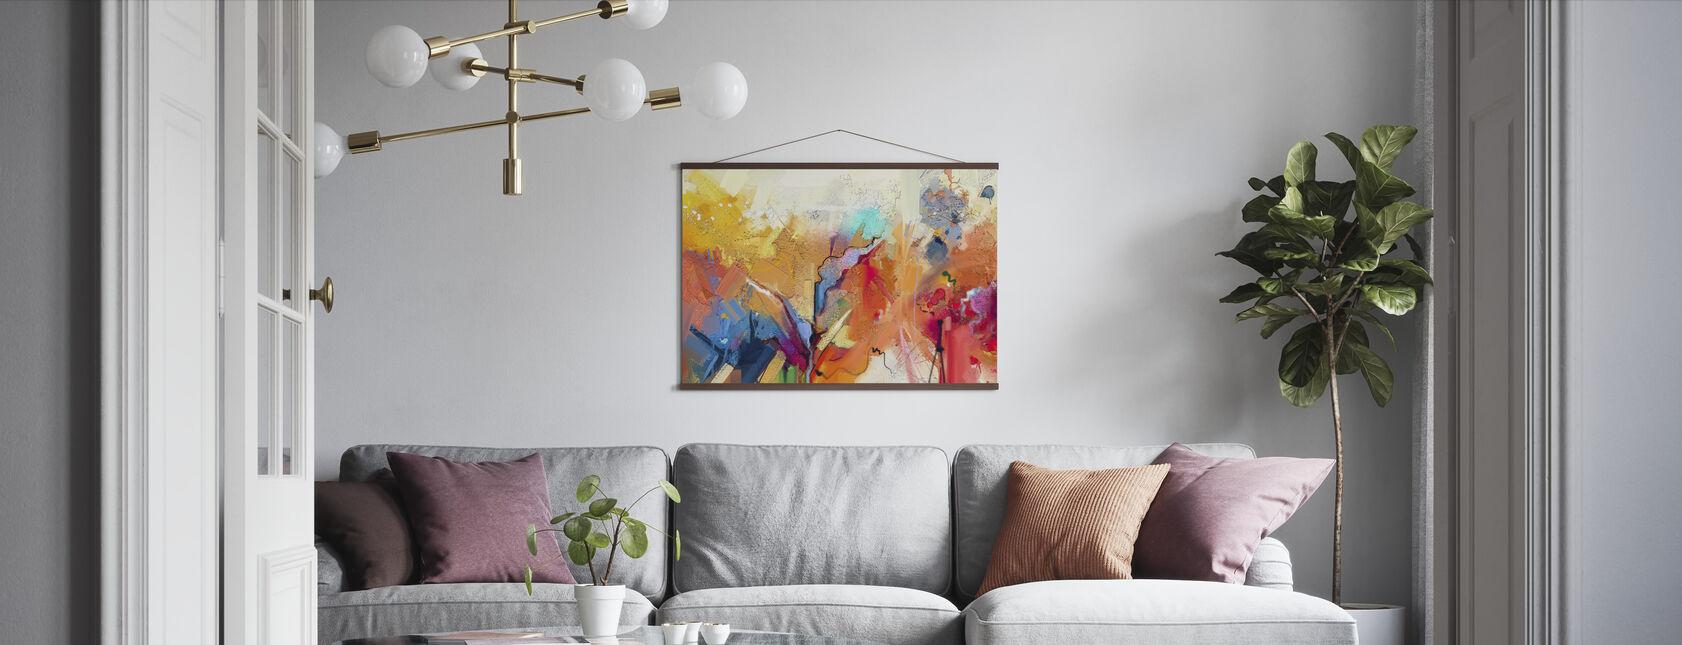 Farverige abstrakt maleri - Plakat - Stue